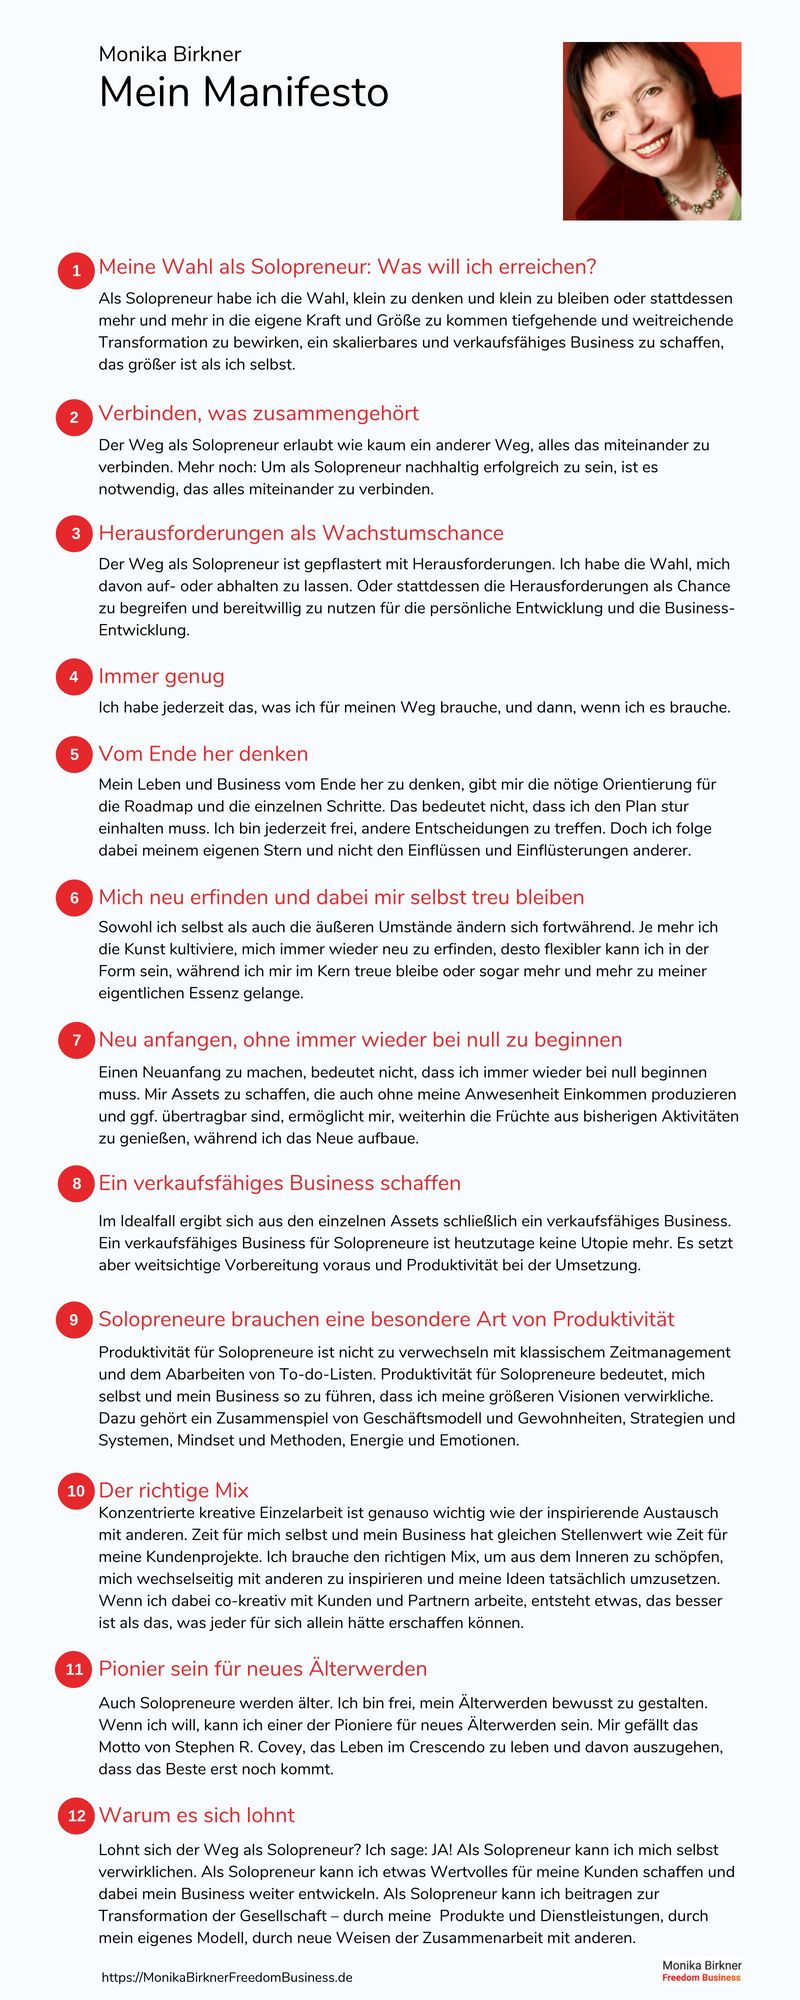 Monika Birkner Manifesto